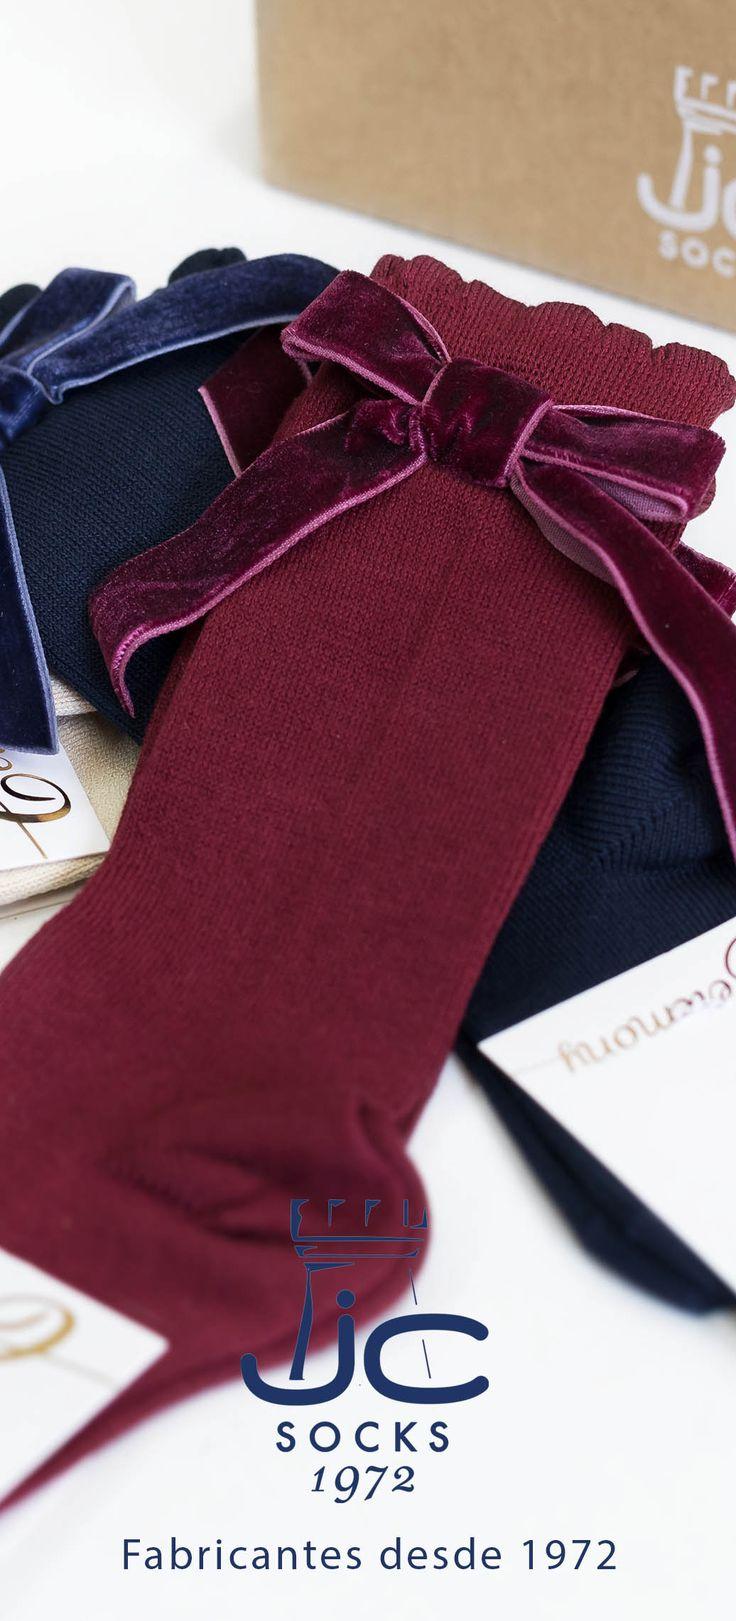 Calcetines altos lazo terciopelo para bebé. JC Castellà fabricantes de calcetines desde 1972